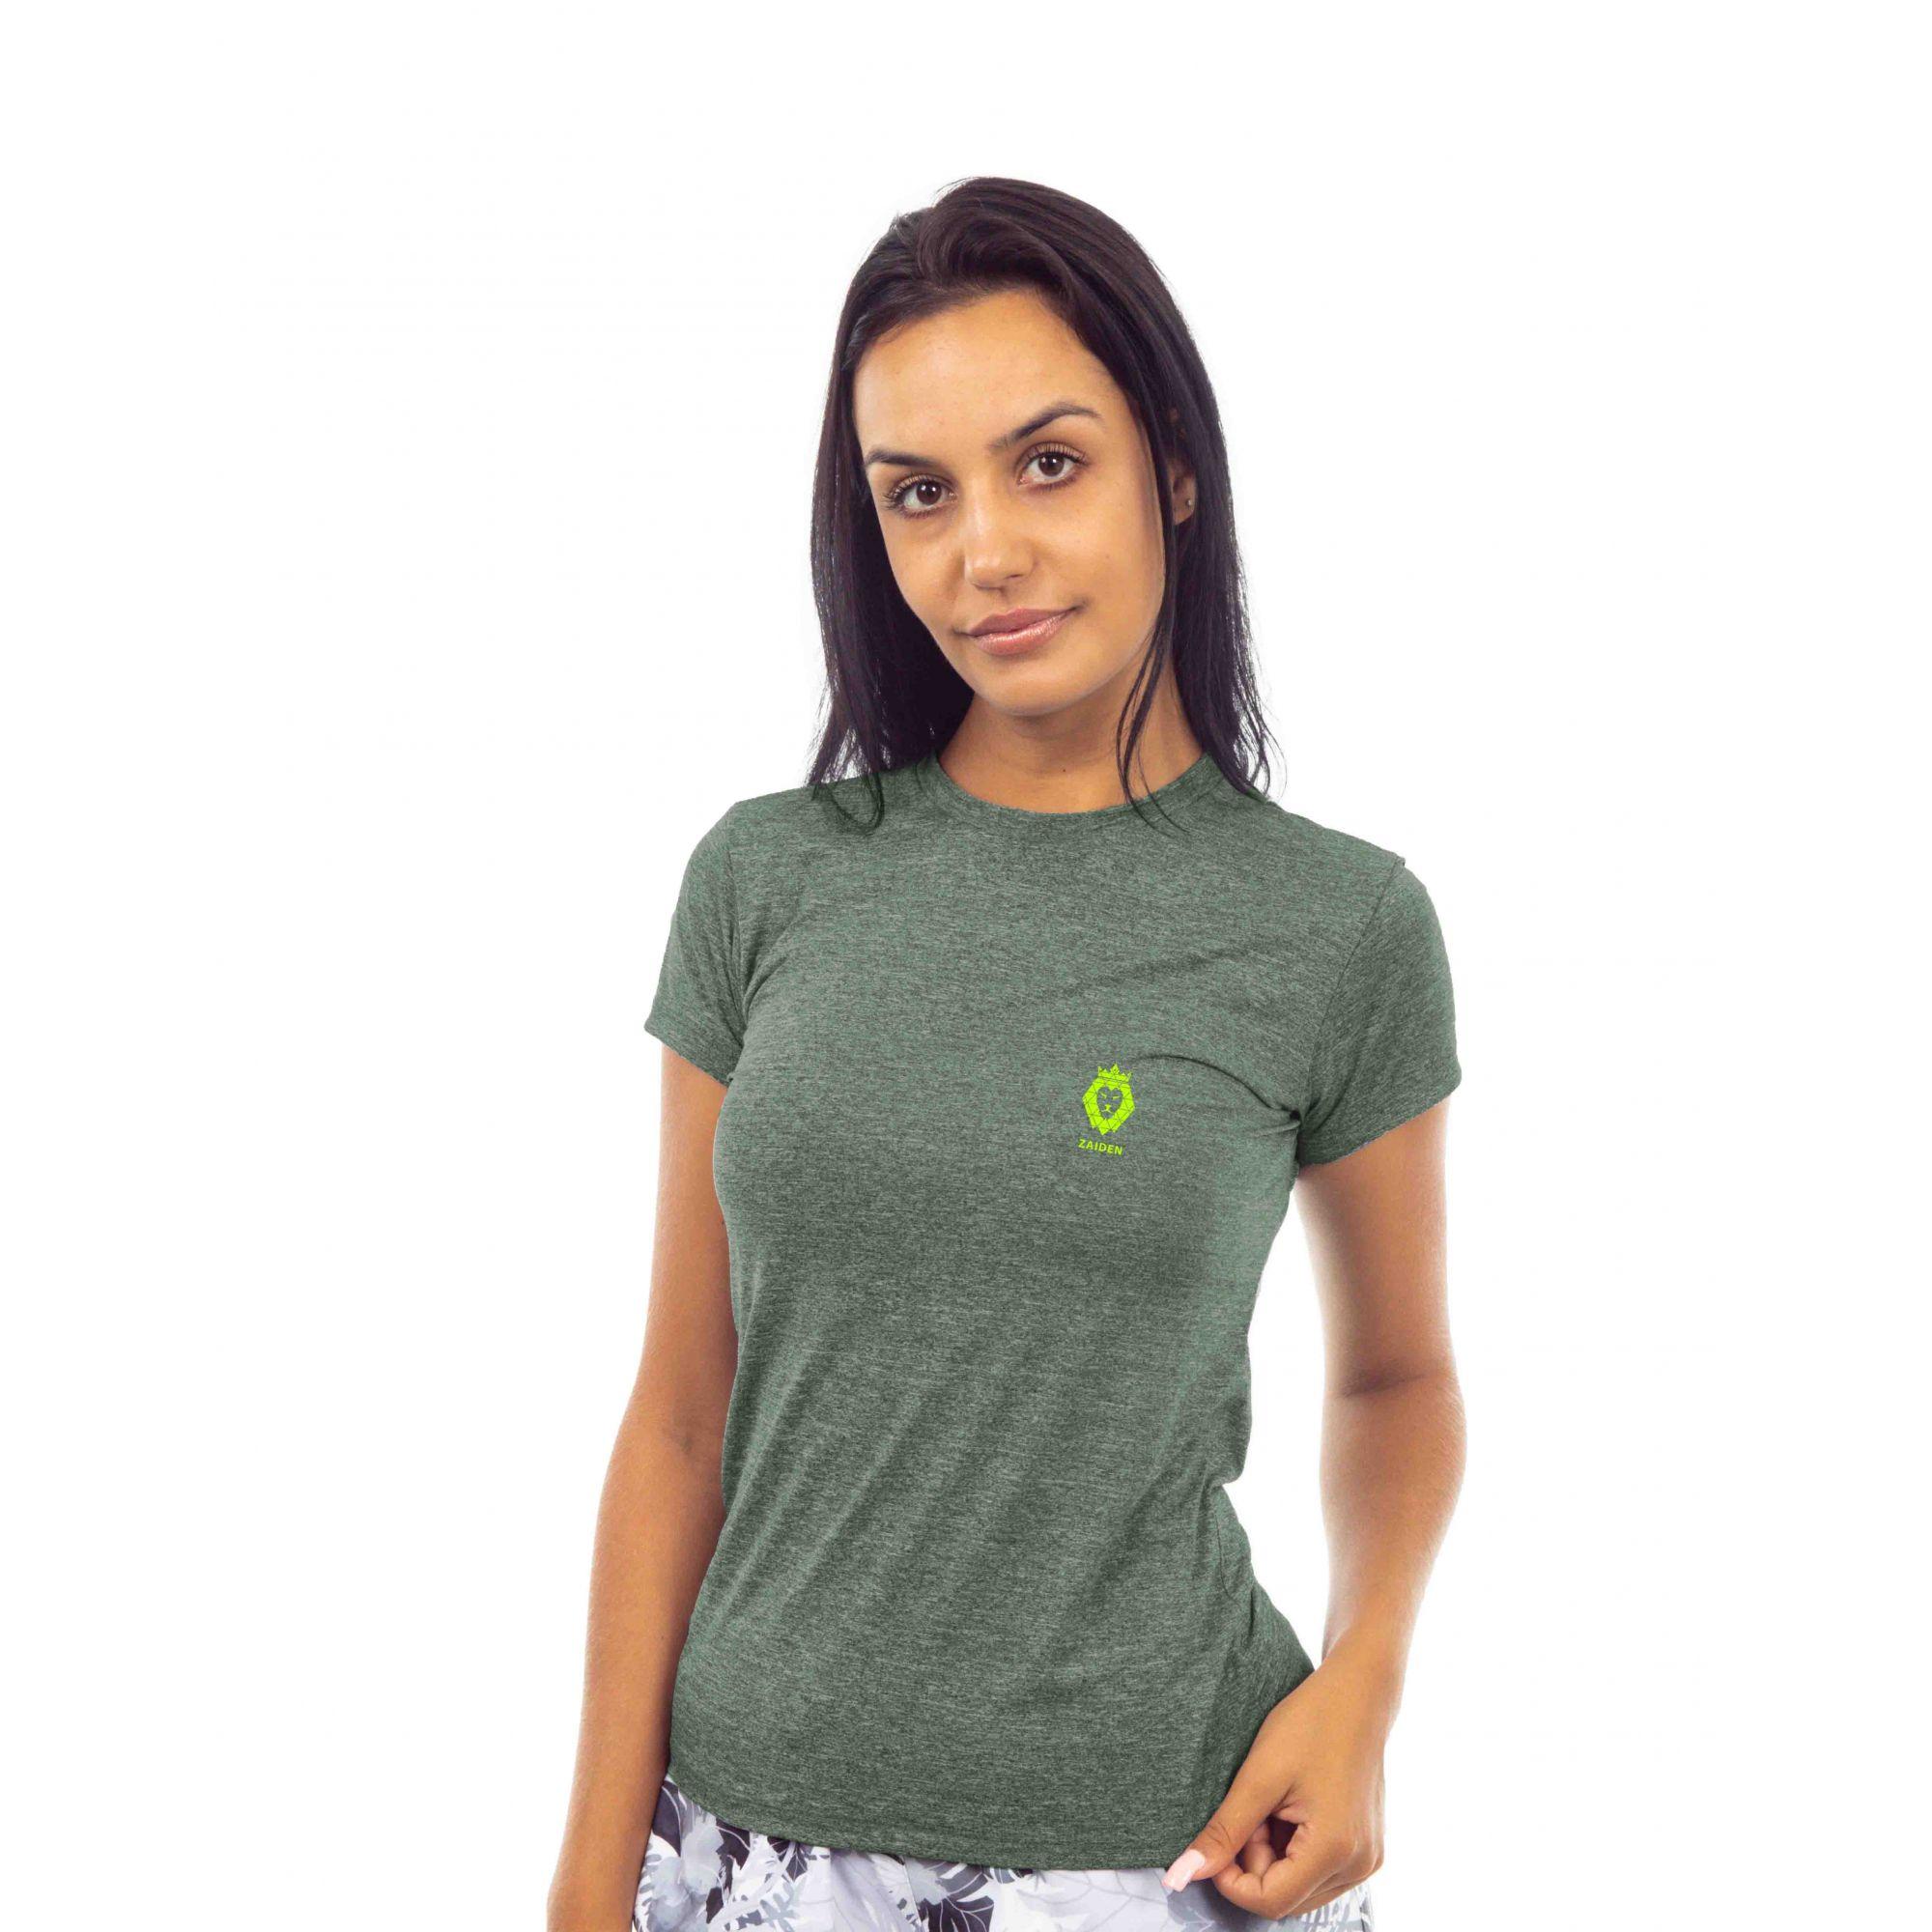 Camiseta Feminina Poliamida Zaiden Oxy Mescla Verde Leão Amarelo